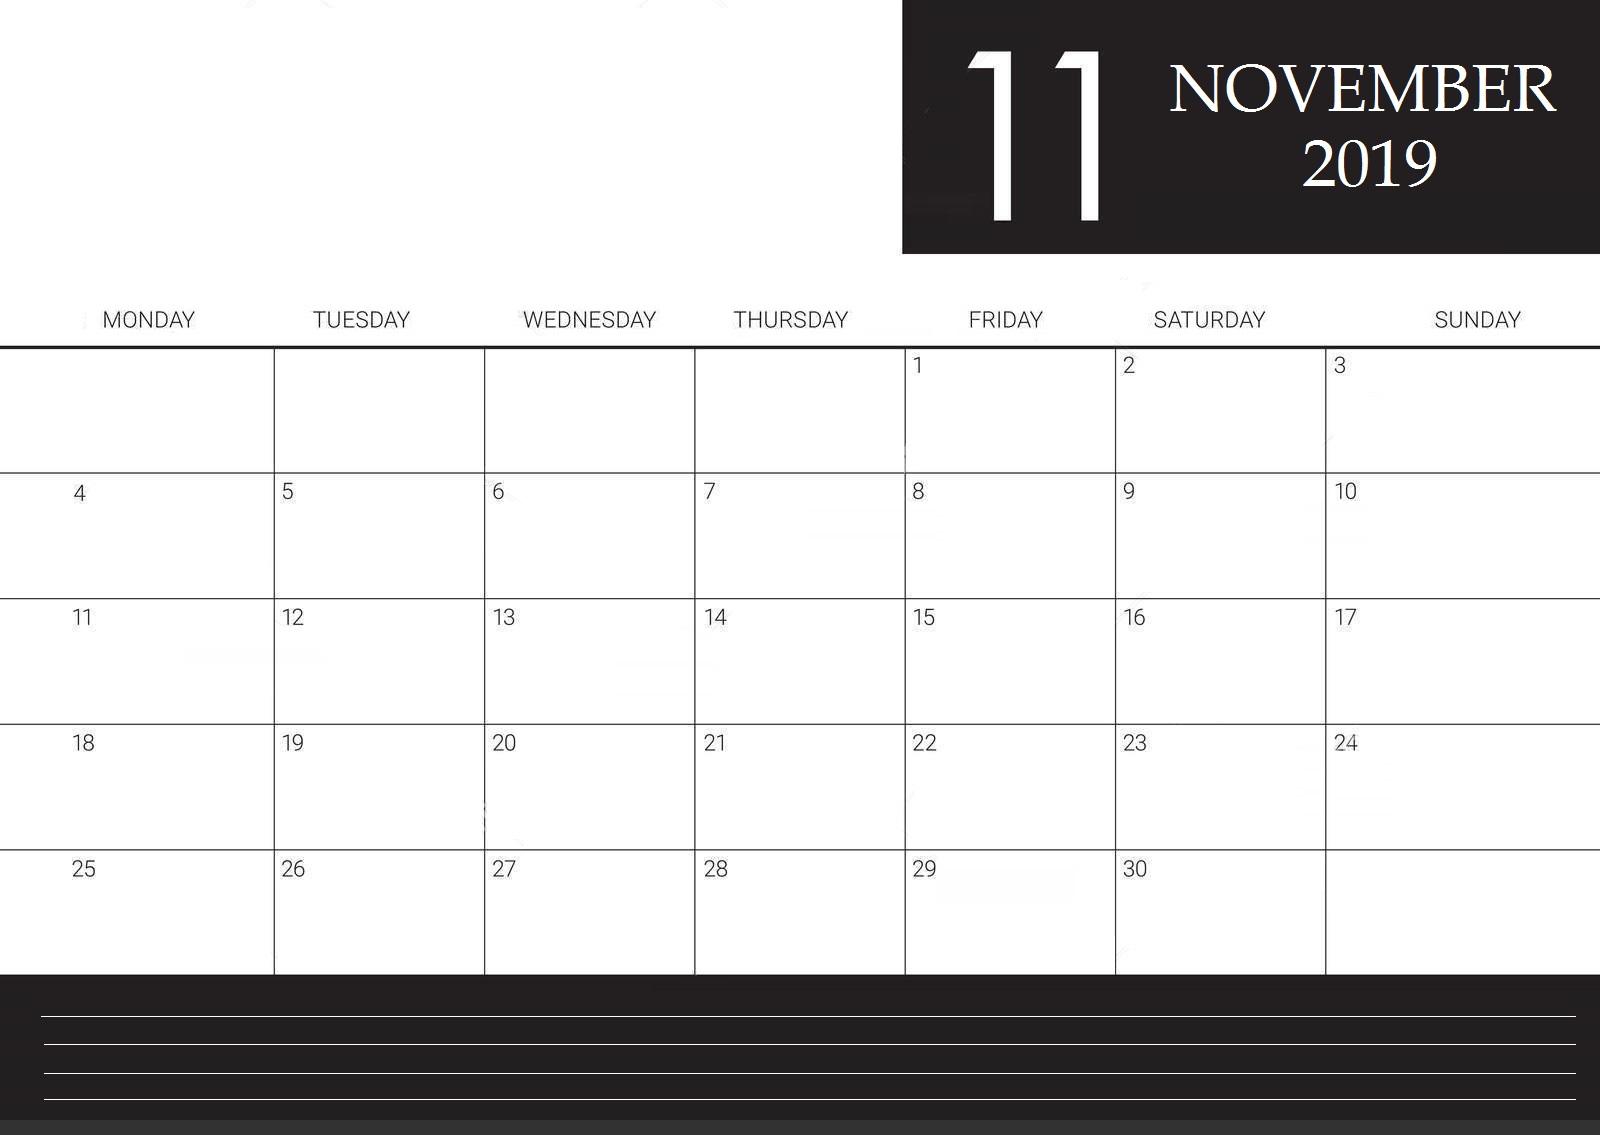 November 2019 Calendar For Workplace